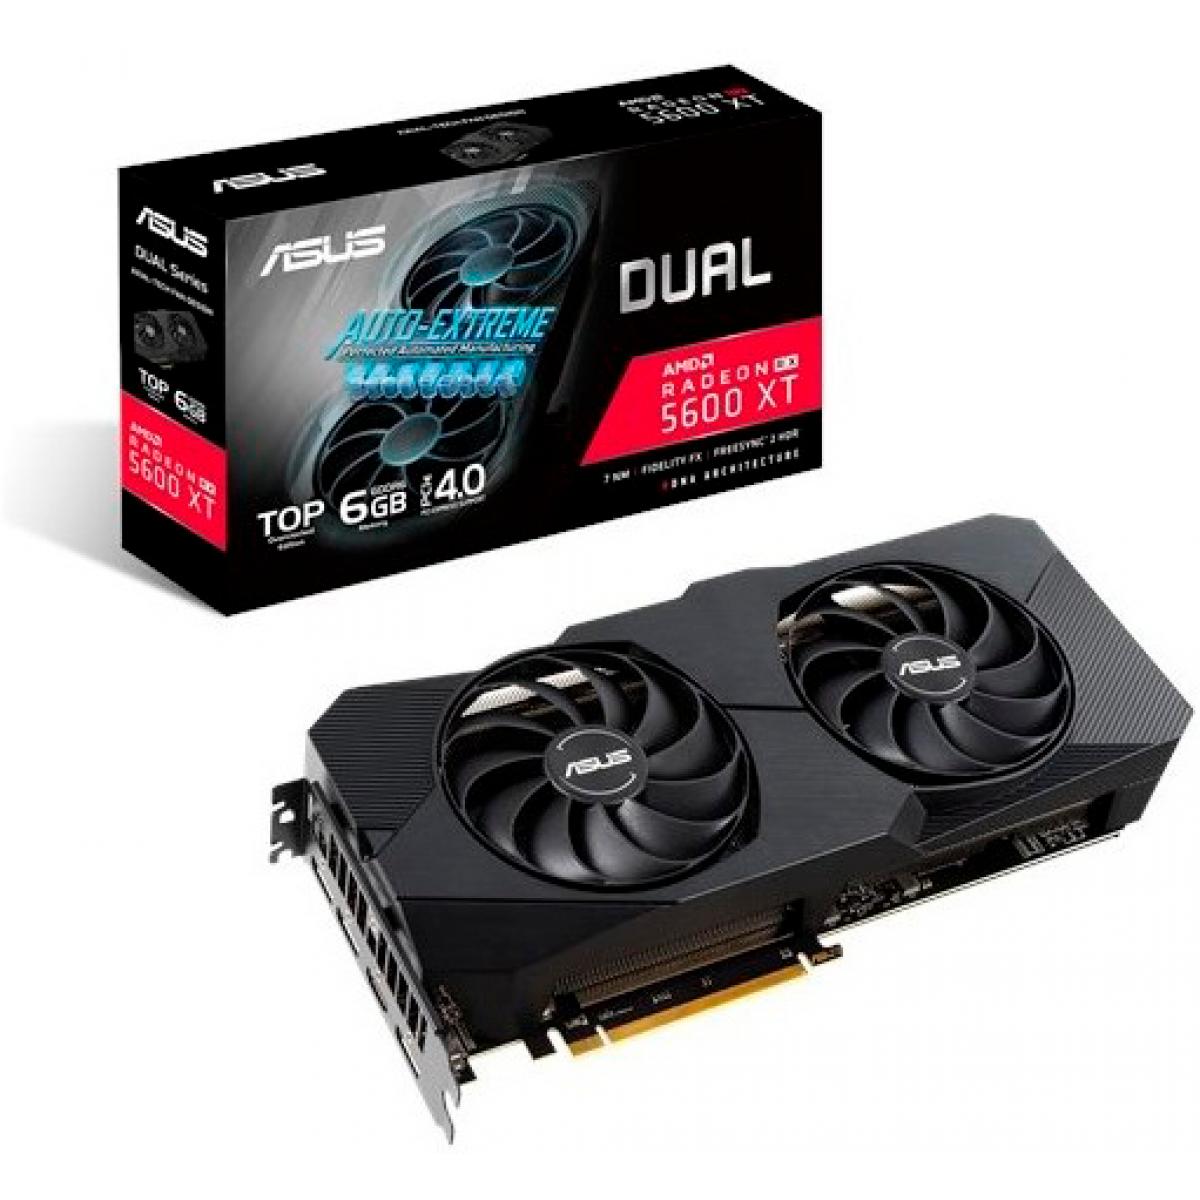 Placa de Vídeo Asus, Radeon, Navi RX 5600 XT EVO, 6GB, GDDR6, 192Bit, DUAL-RX5600XT-T6G-EVO